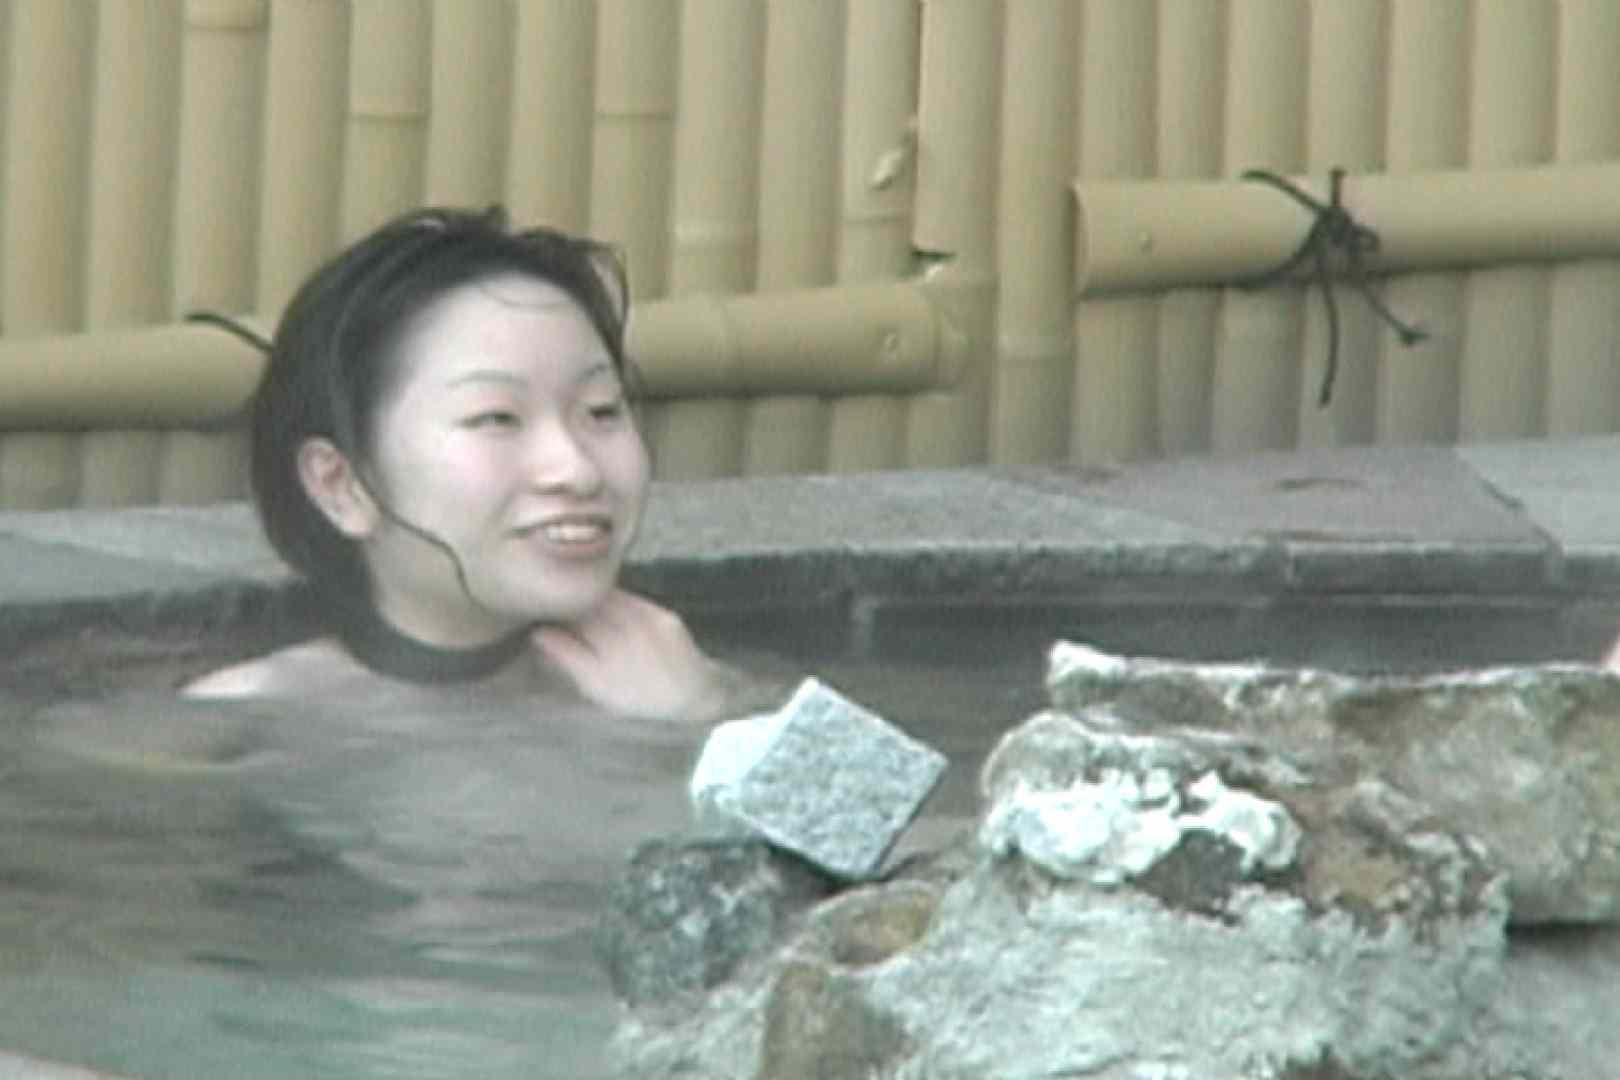 Aquaな露天風呂Vol.595 HなOL | 露天  65pic 62